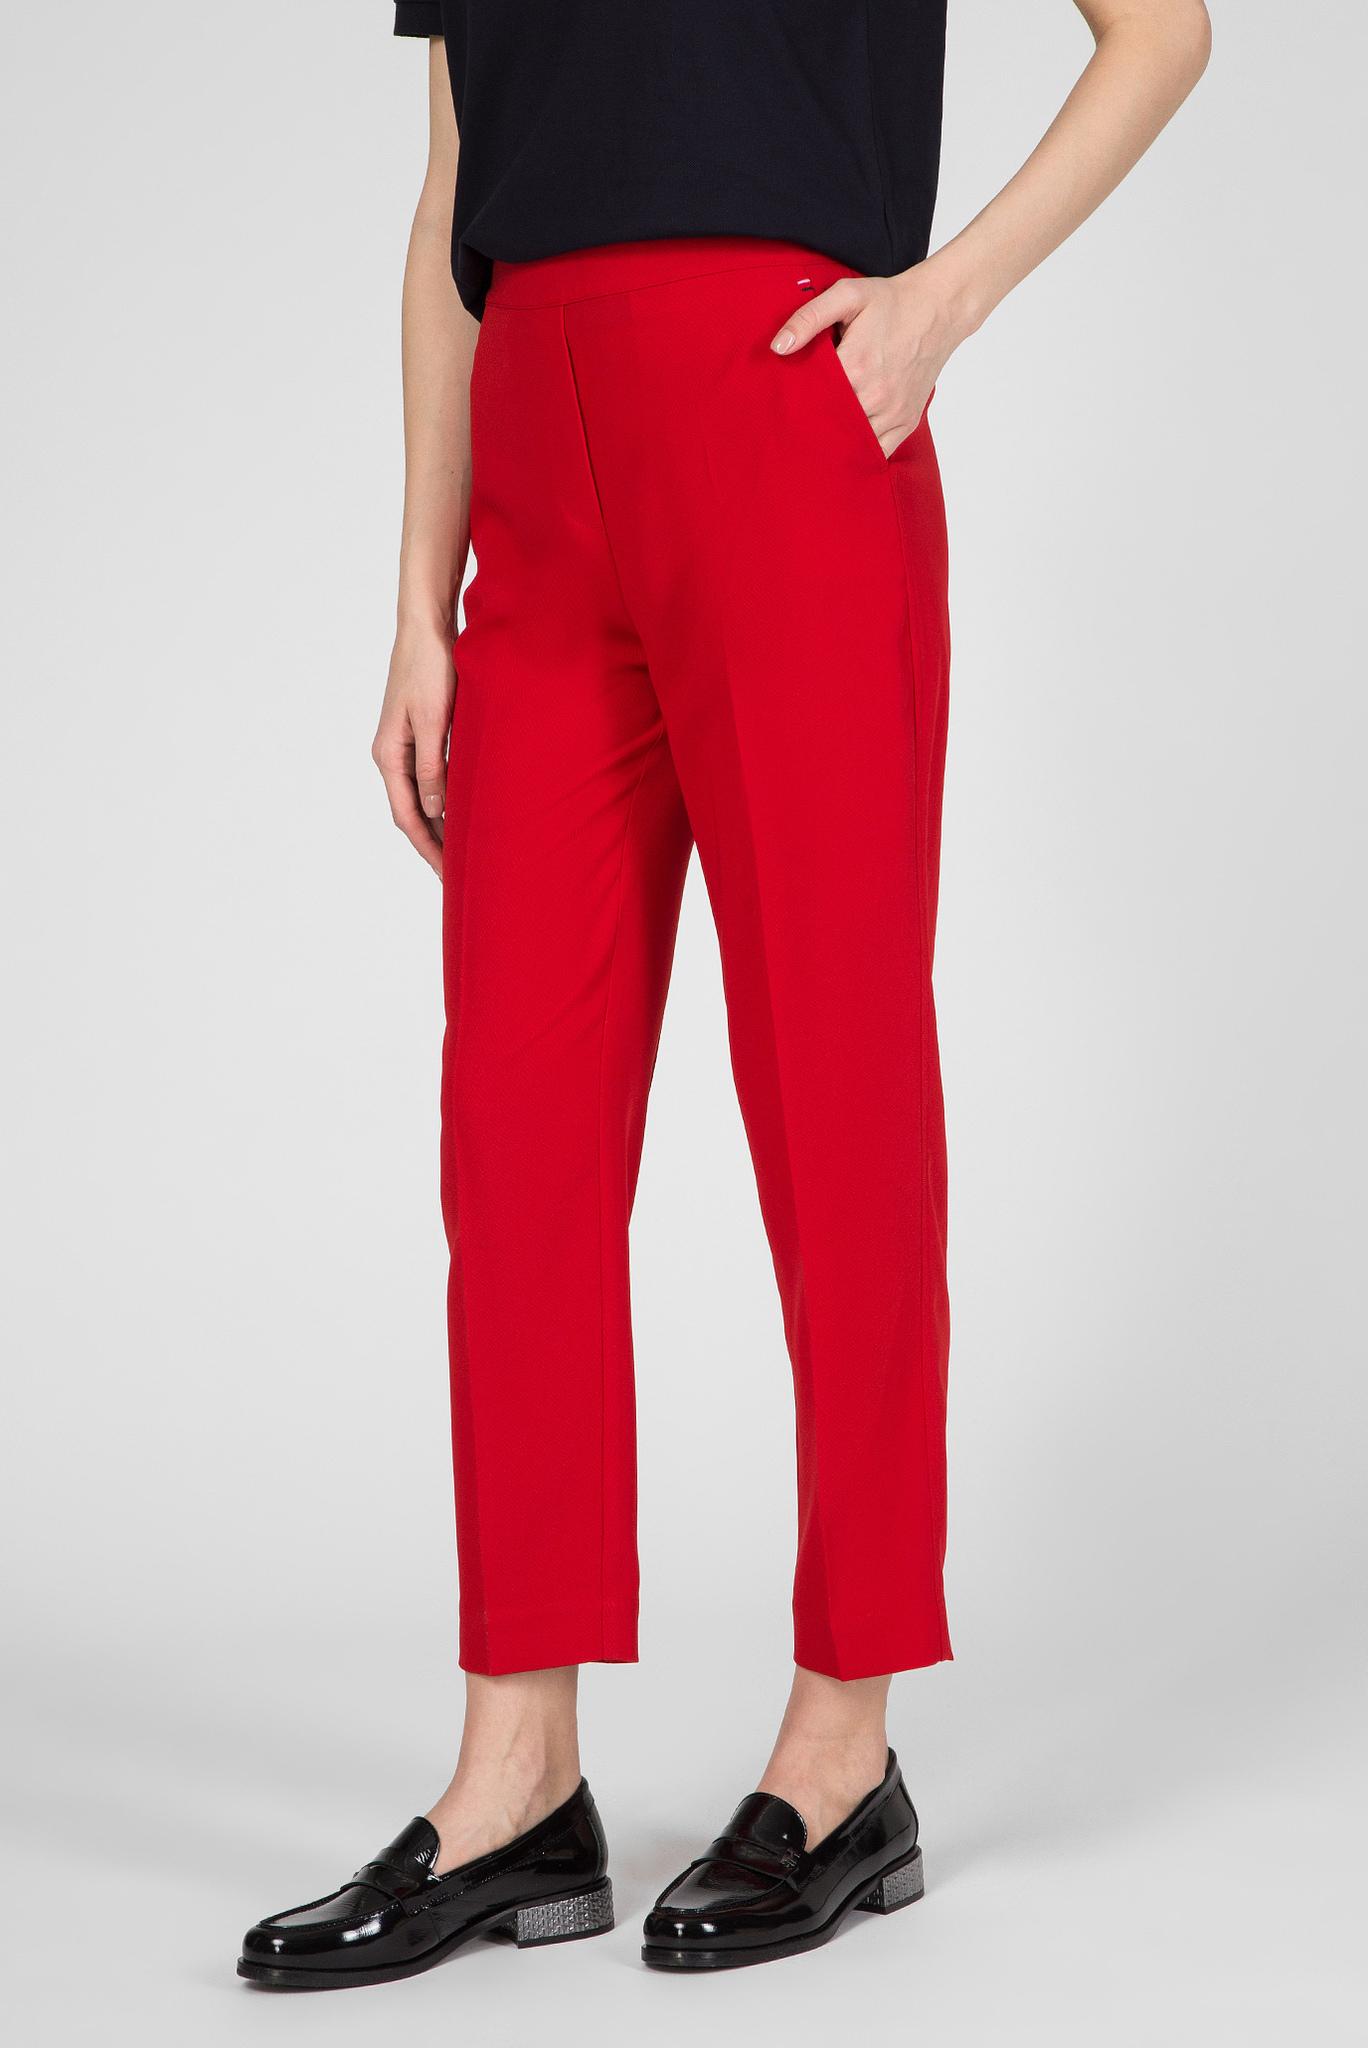 Женские красные брюки TH ESS POLY TWILL TAPERED Tommy Hilfiger